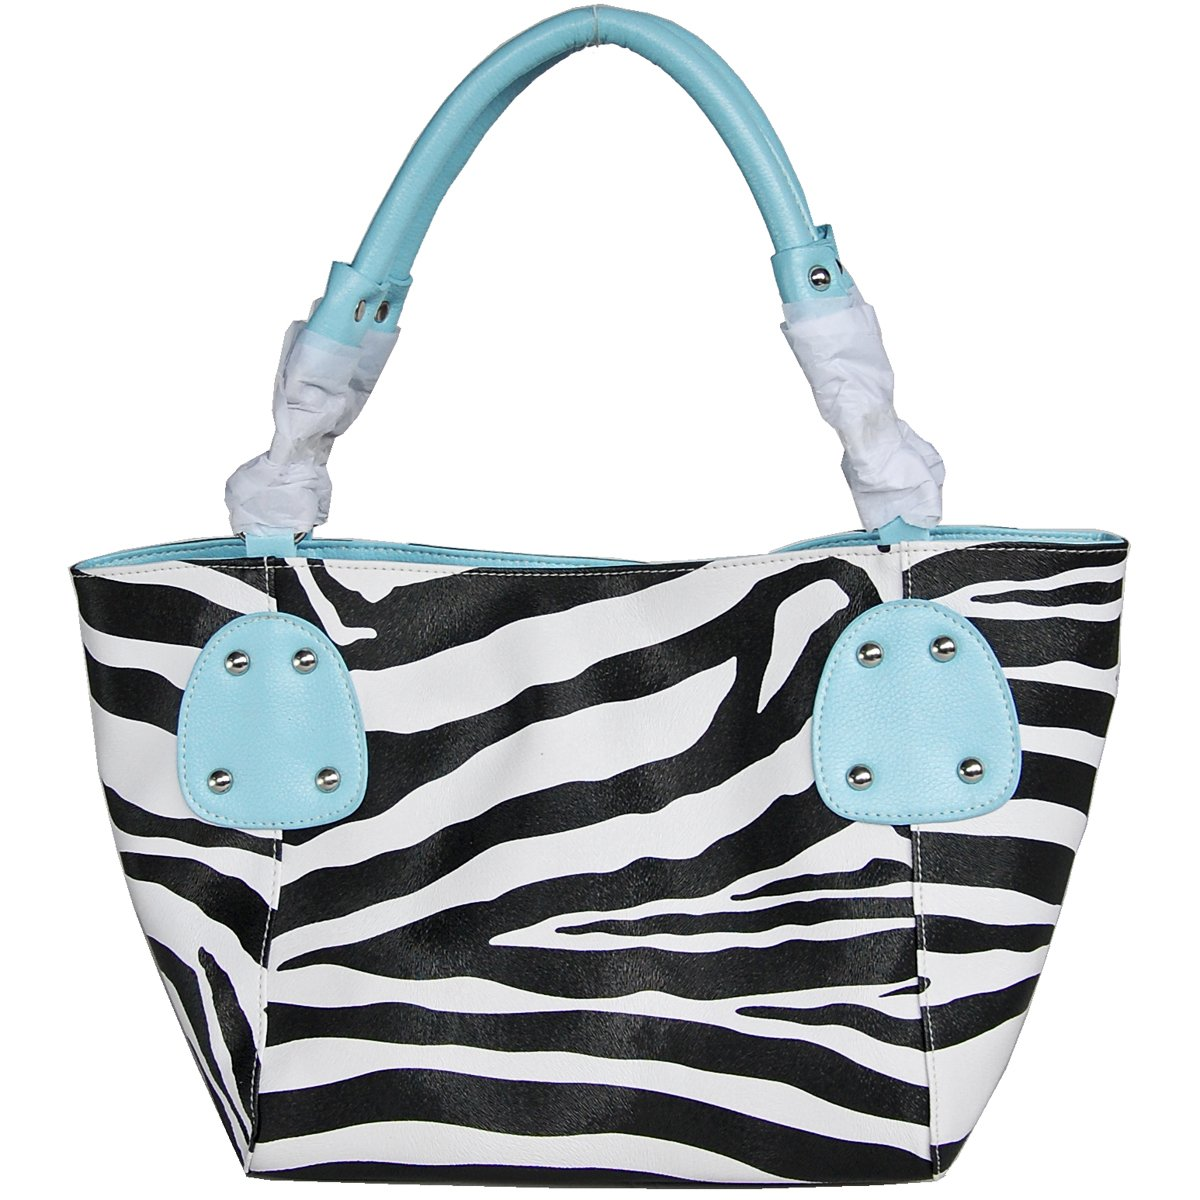 Large Zebra Print Faux Leather Tote Handbag